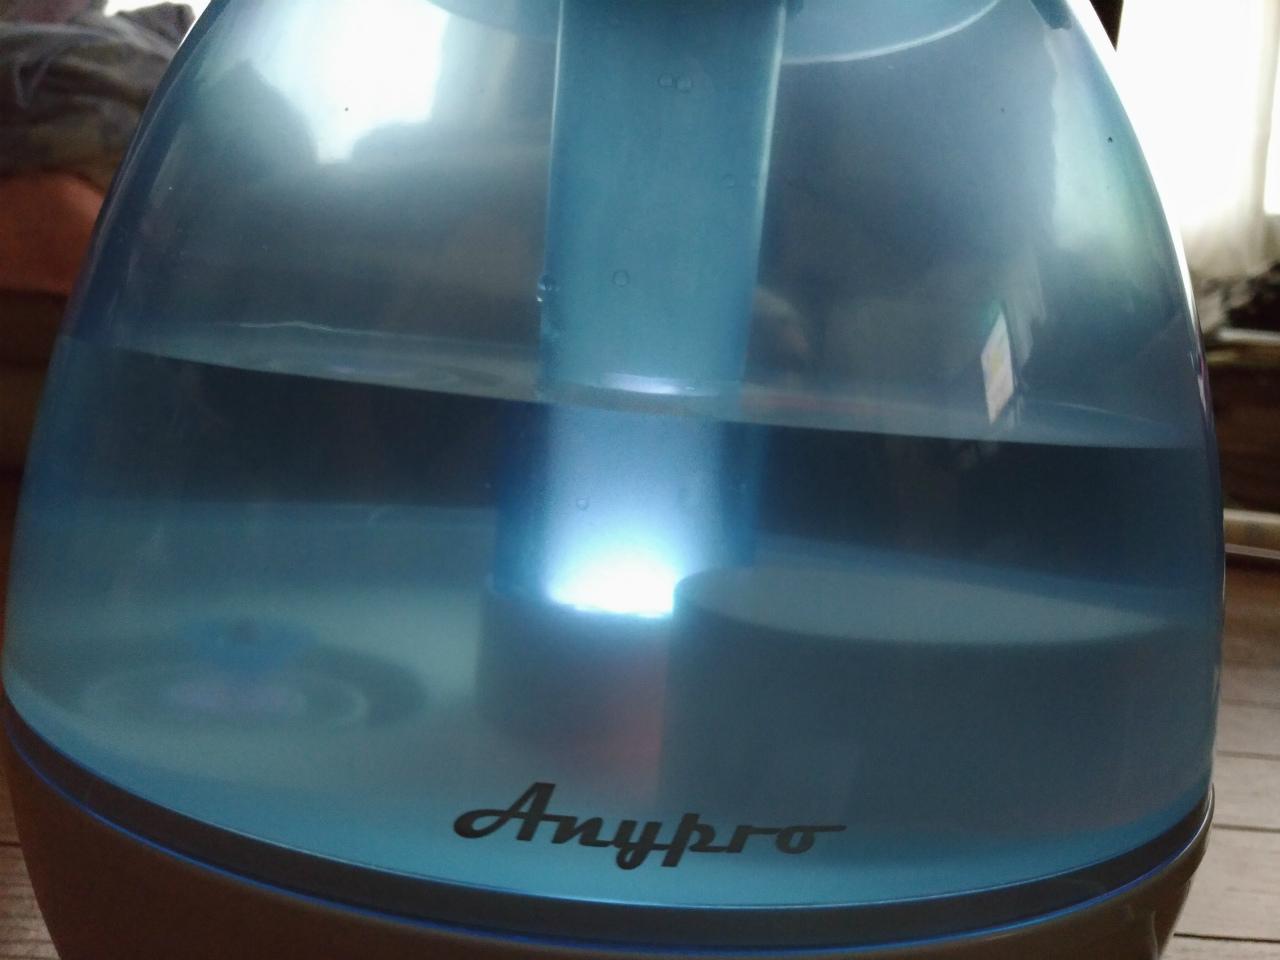 pr-anypro-cf-2530a-13